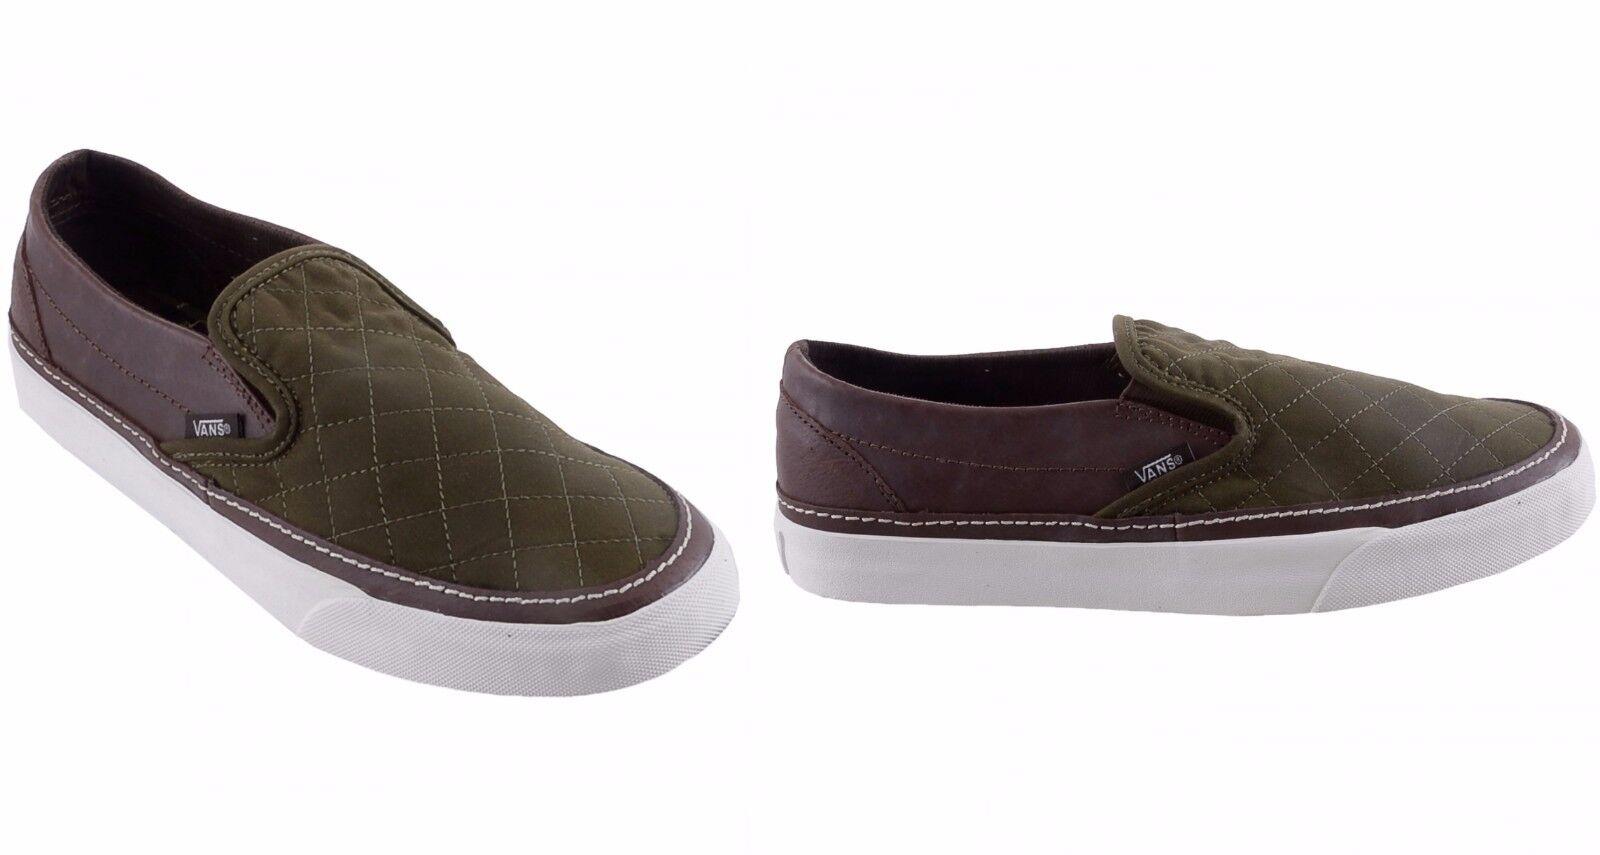 VANS CLASSIC SLIP-ON Unisex Sneakers Sportschuhe Canvas, Grün-Braun, EU 36.5, 37